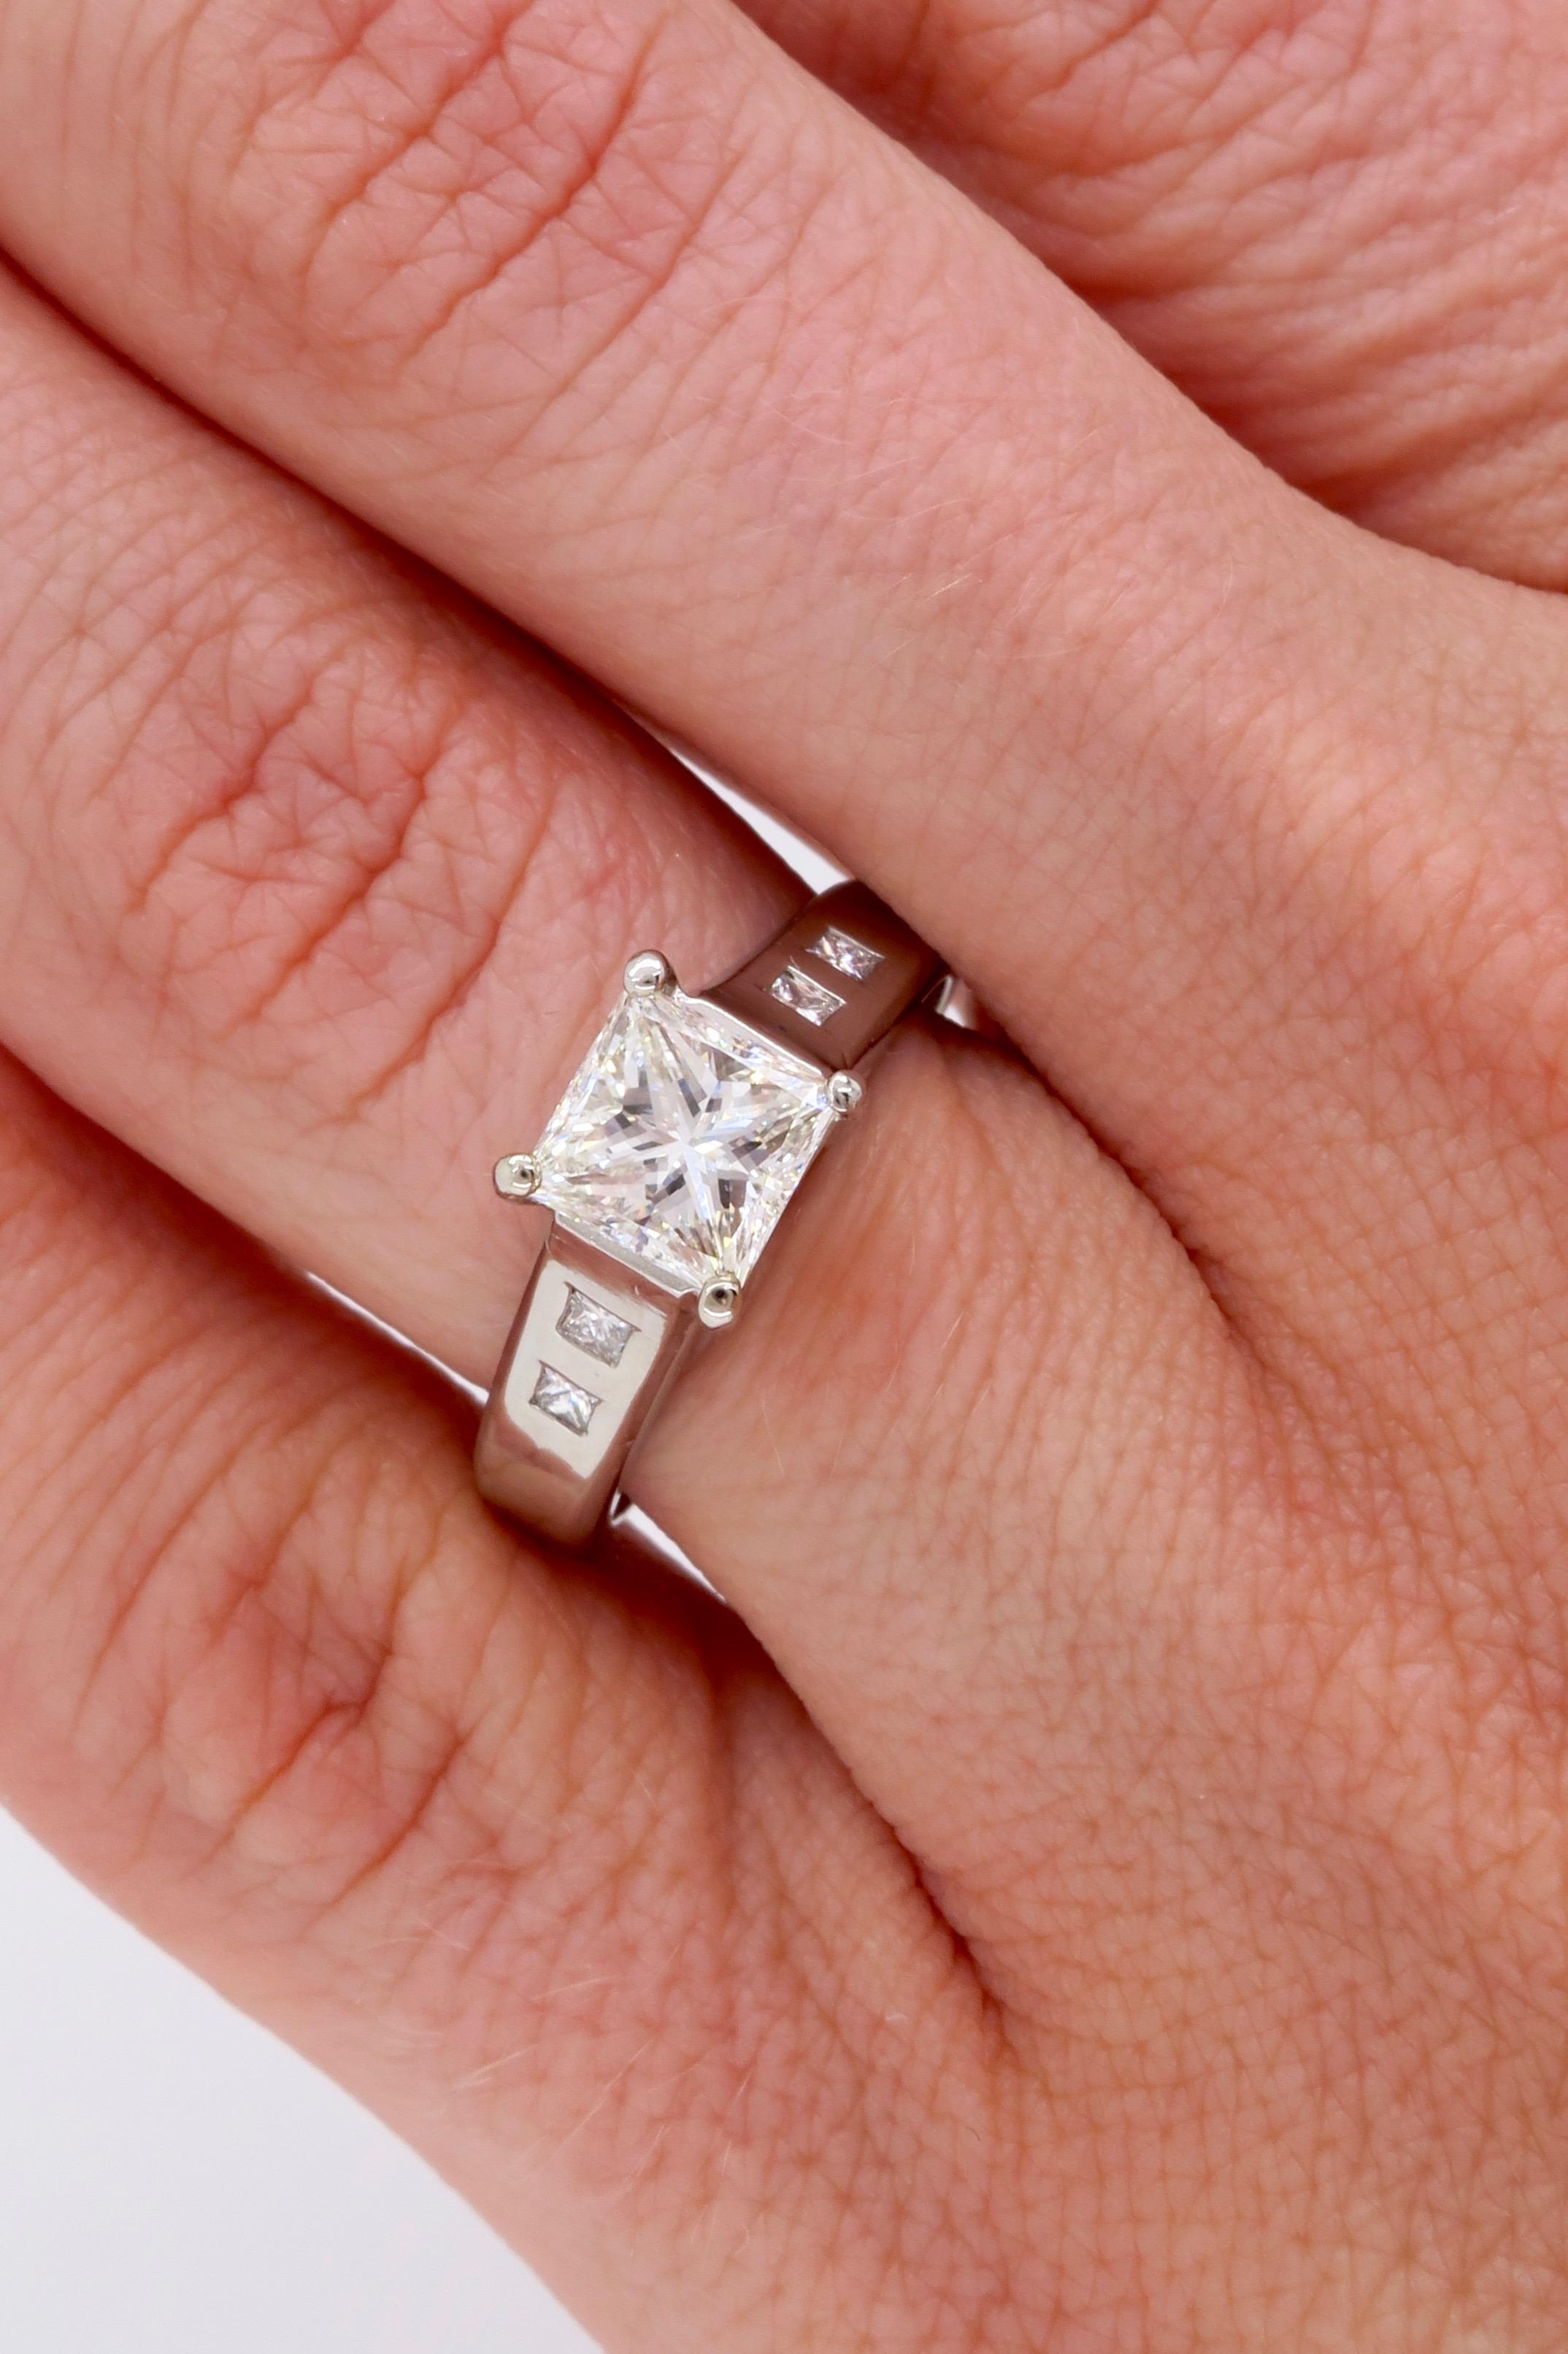 Platinum Jeff Cooper Diamond Engagement Ring | Property Room